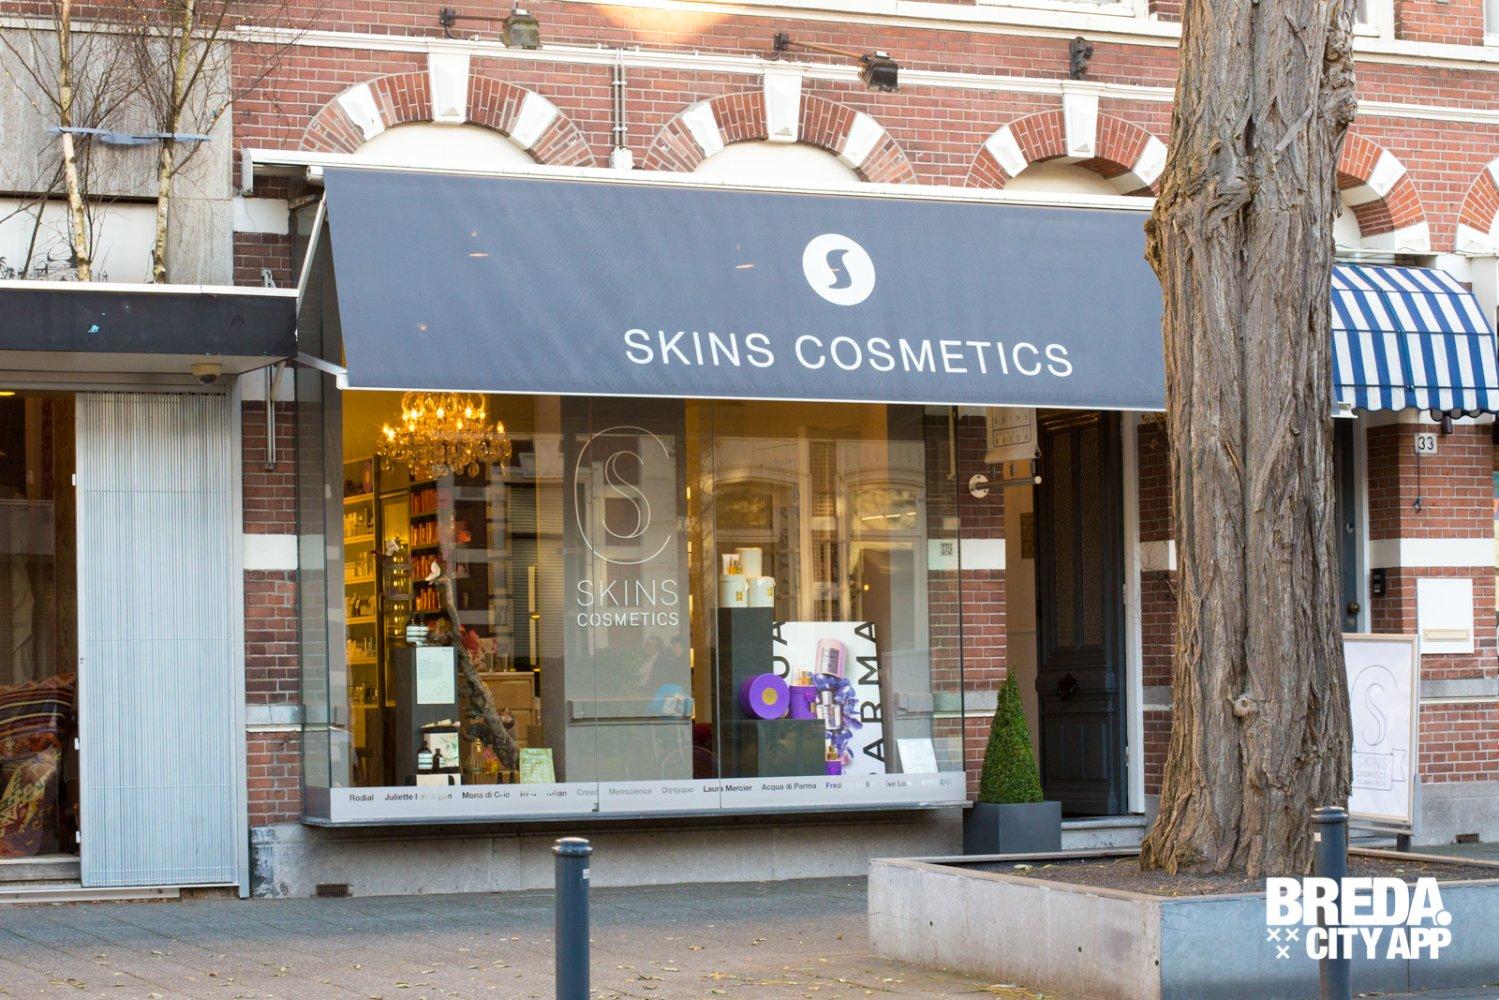 Skins cosmetics stappen shoppen breda for Bioscoopagenda rotterdam